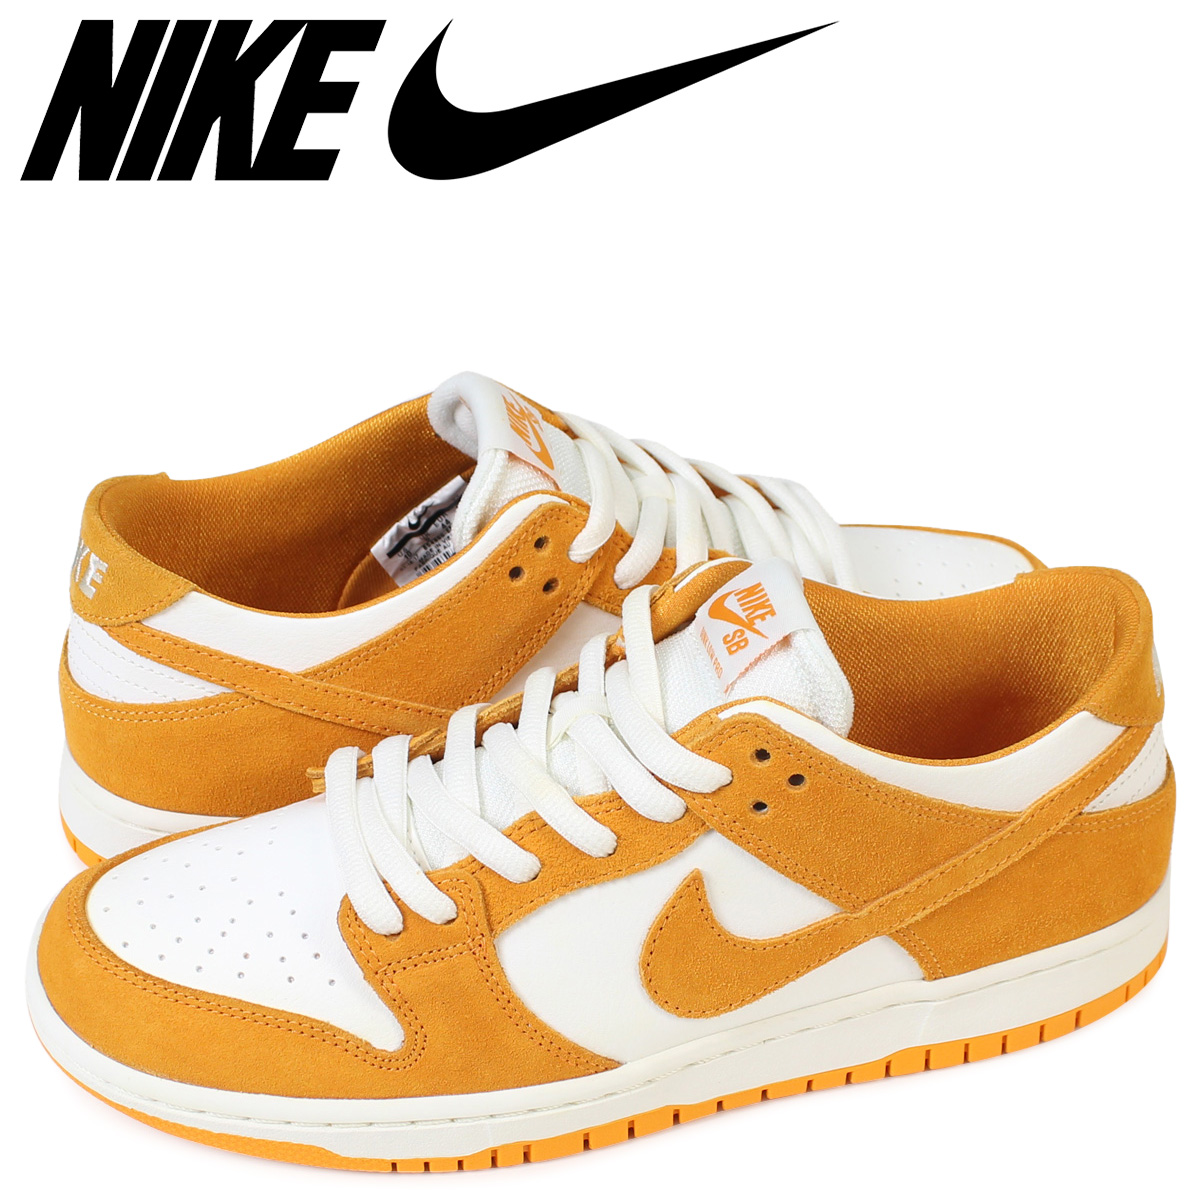 timeless design 8f208 fa2d8 NIKE Nike SB dunk low sneakers ZOOM DUNK LOW PRO 854,866-881 men s shoes  orange ...